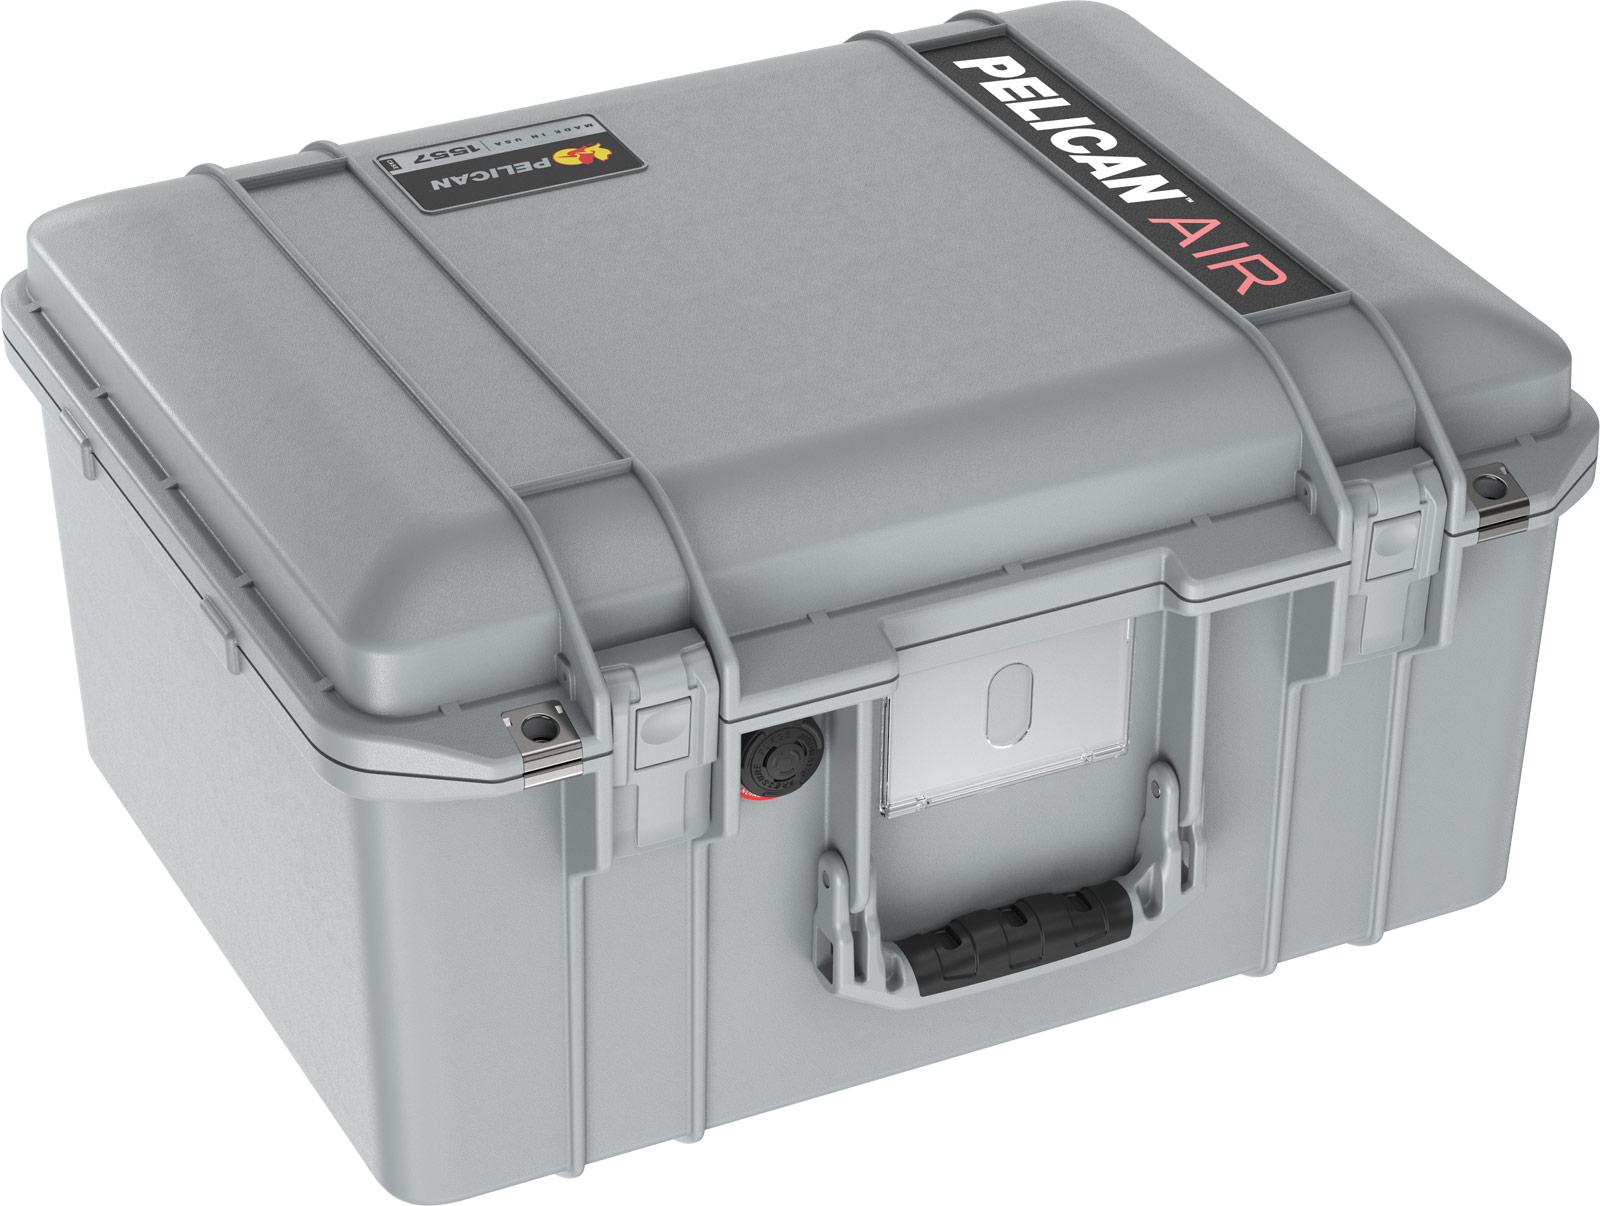 pelican protection air 1557 case gray